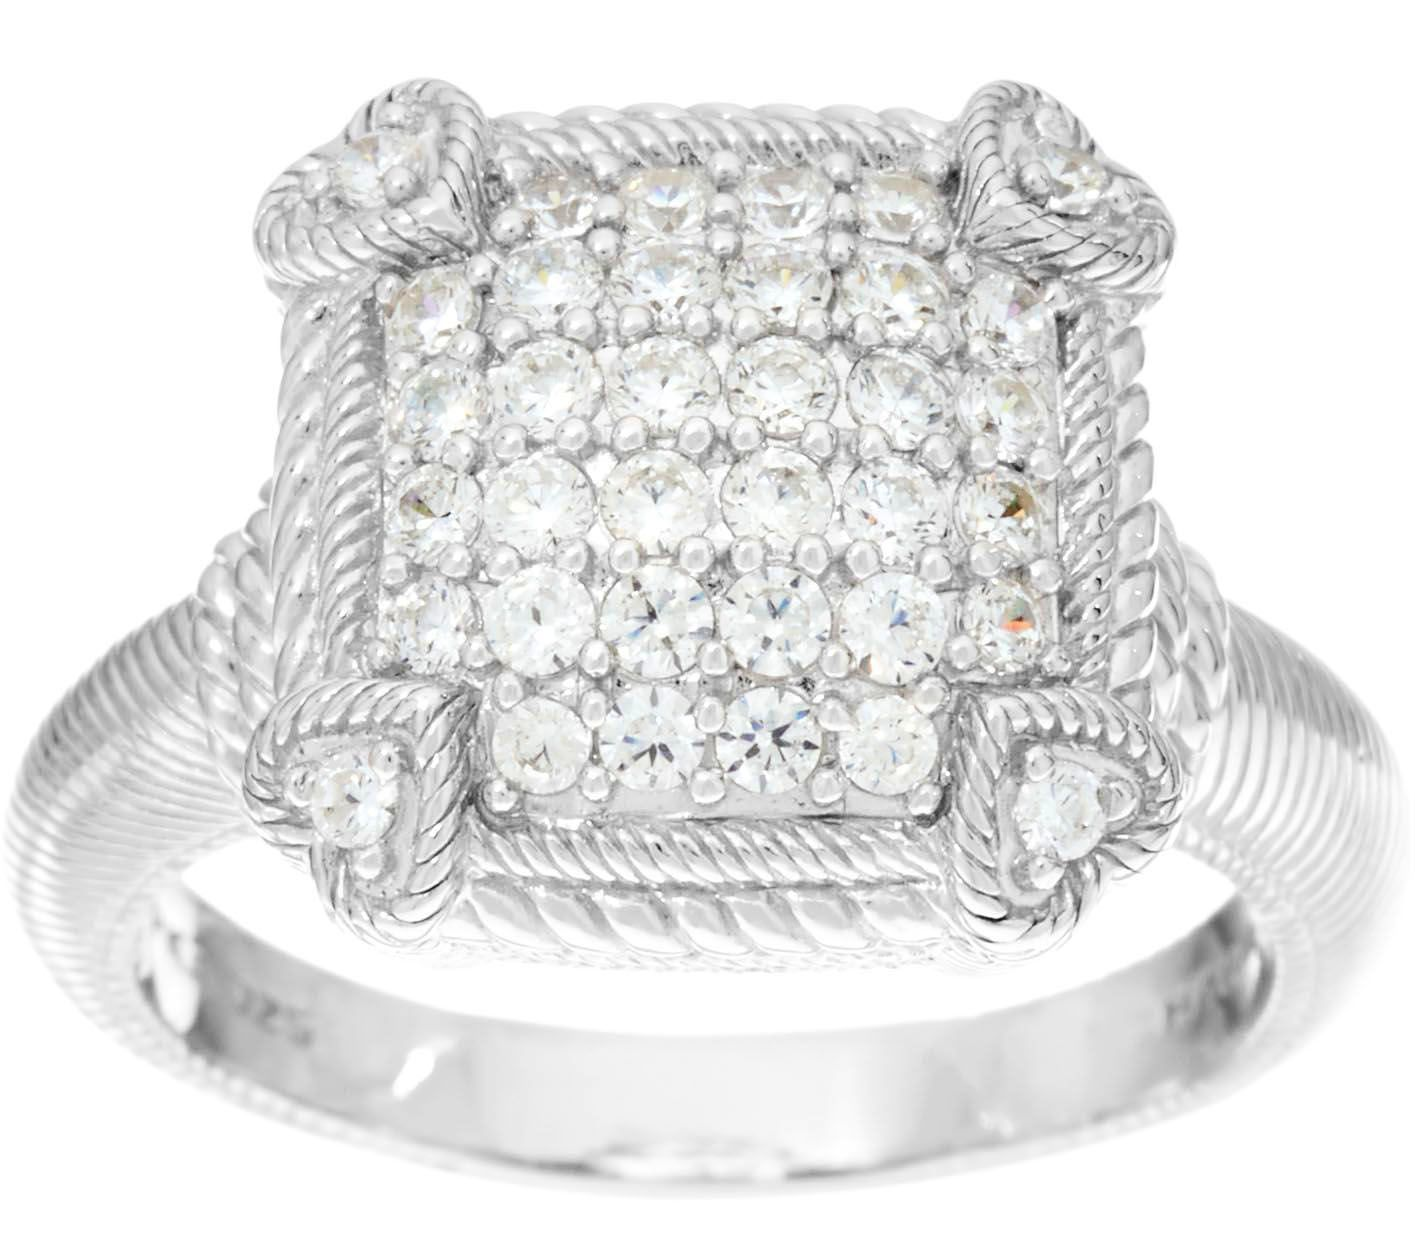 Judith Ripka Rings Jewelry QVCcom